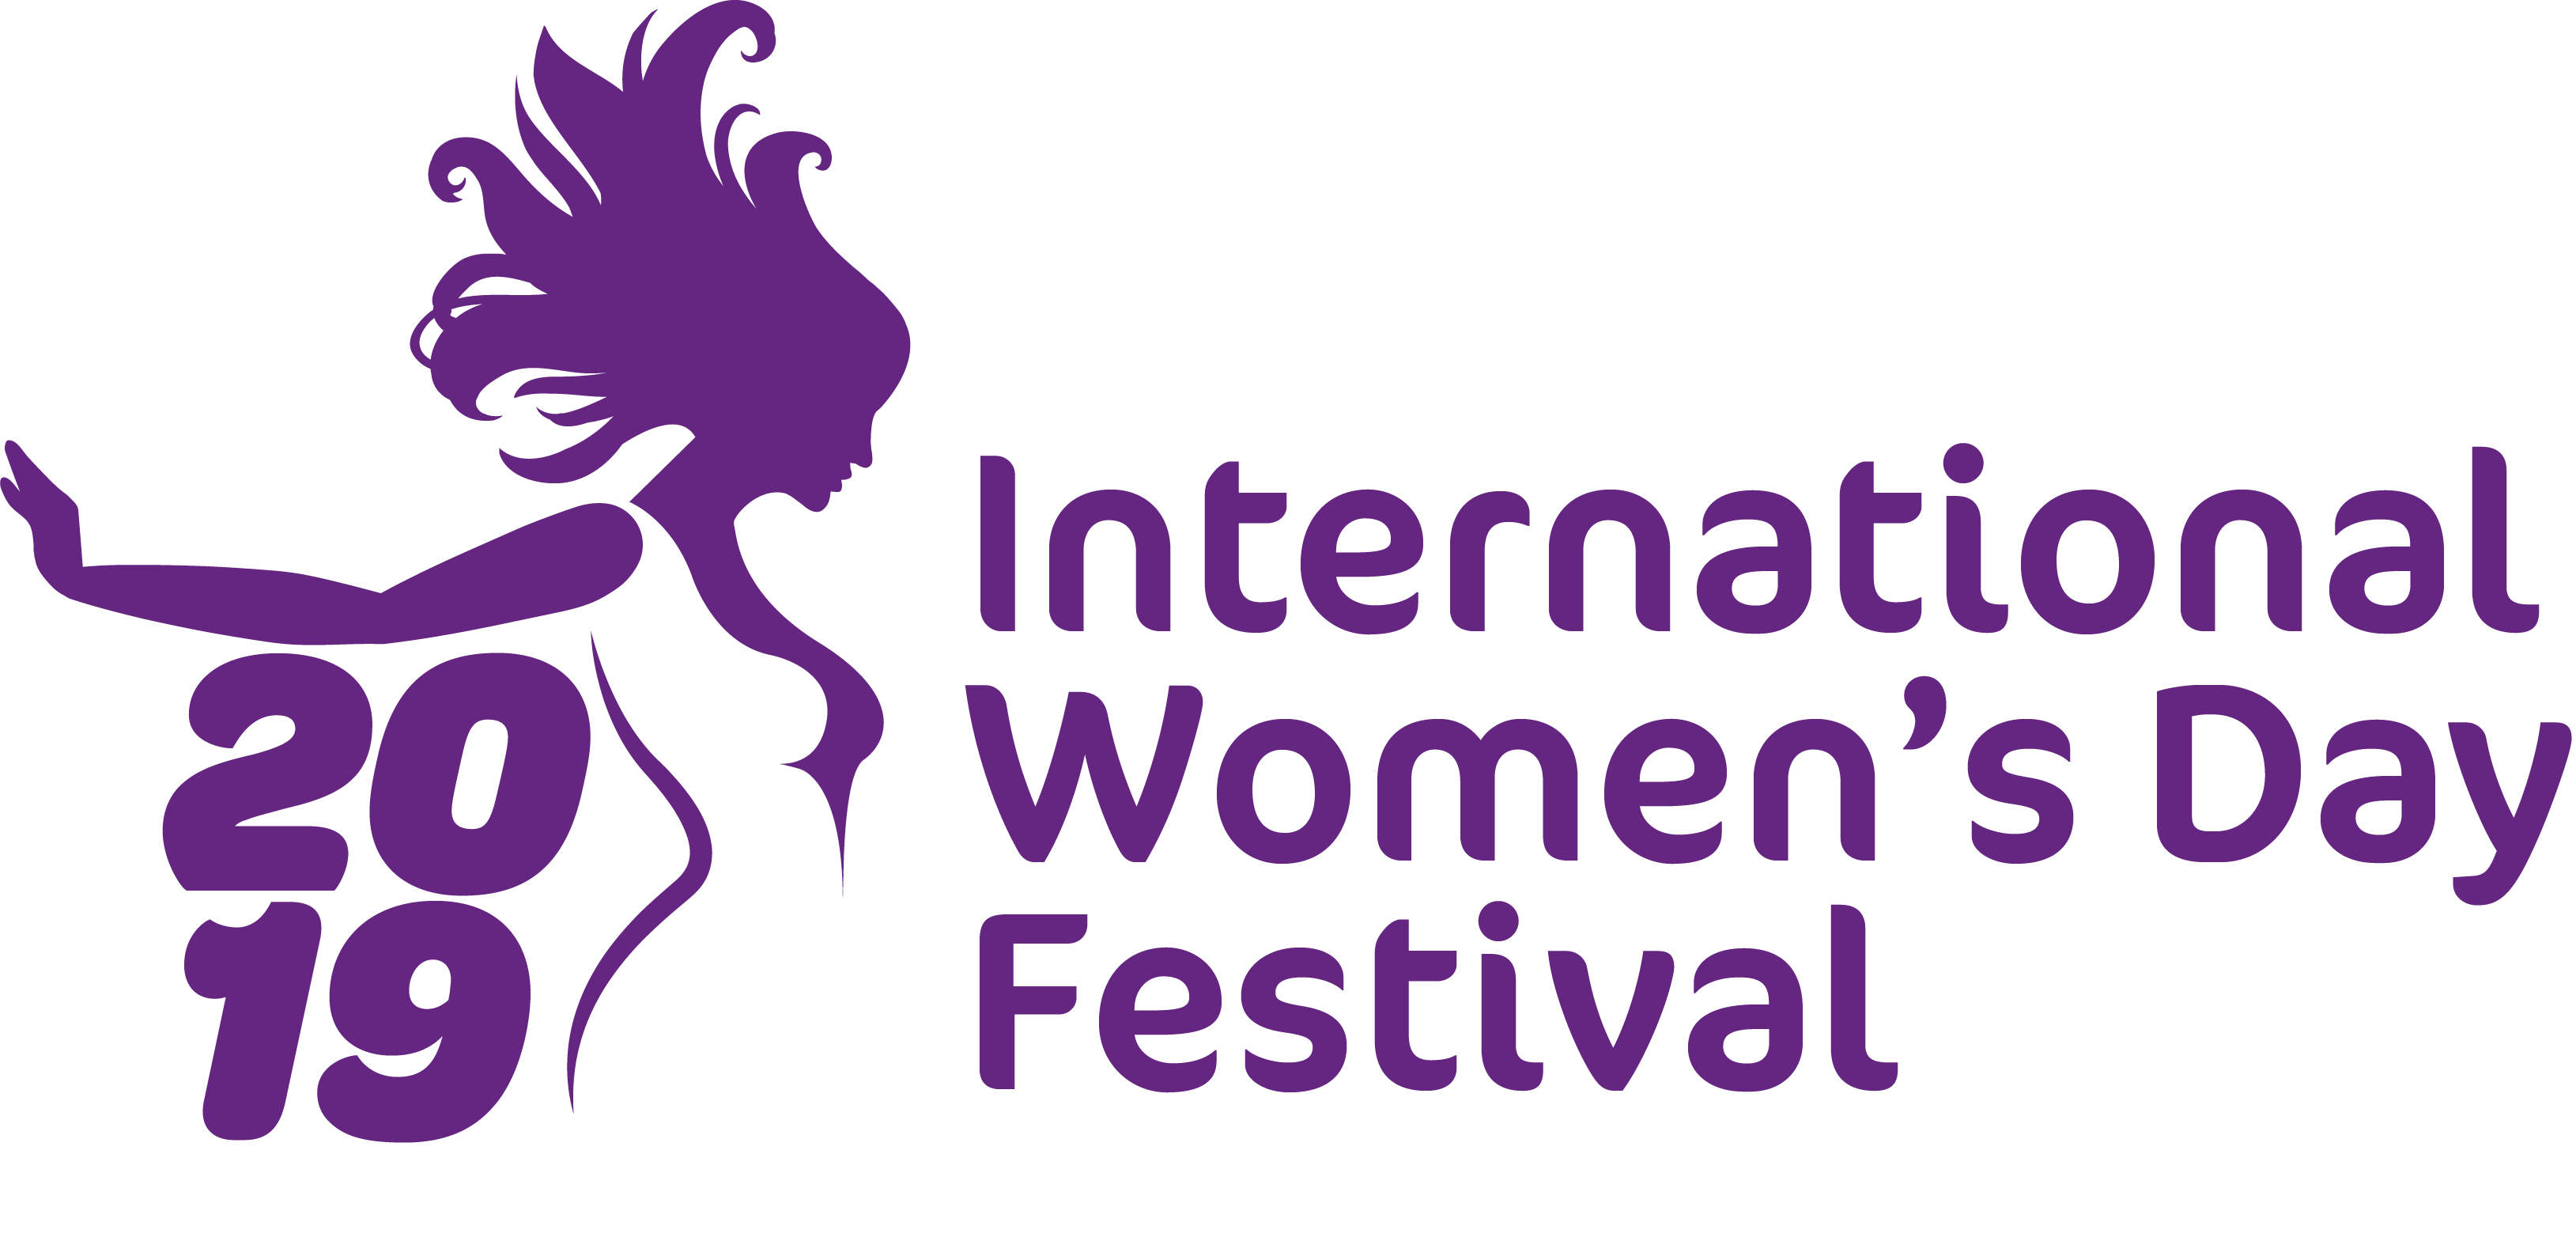 International Women's Day Festival 2019 | The Washington Group